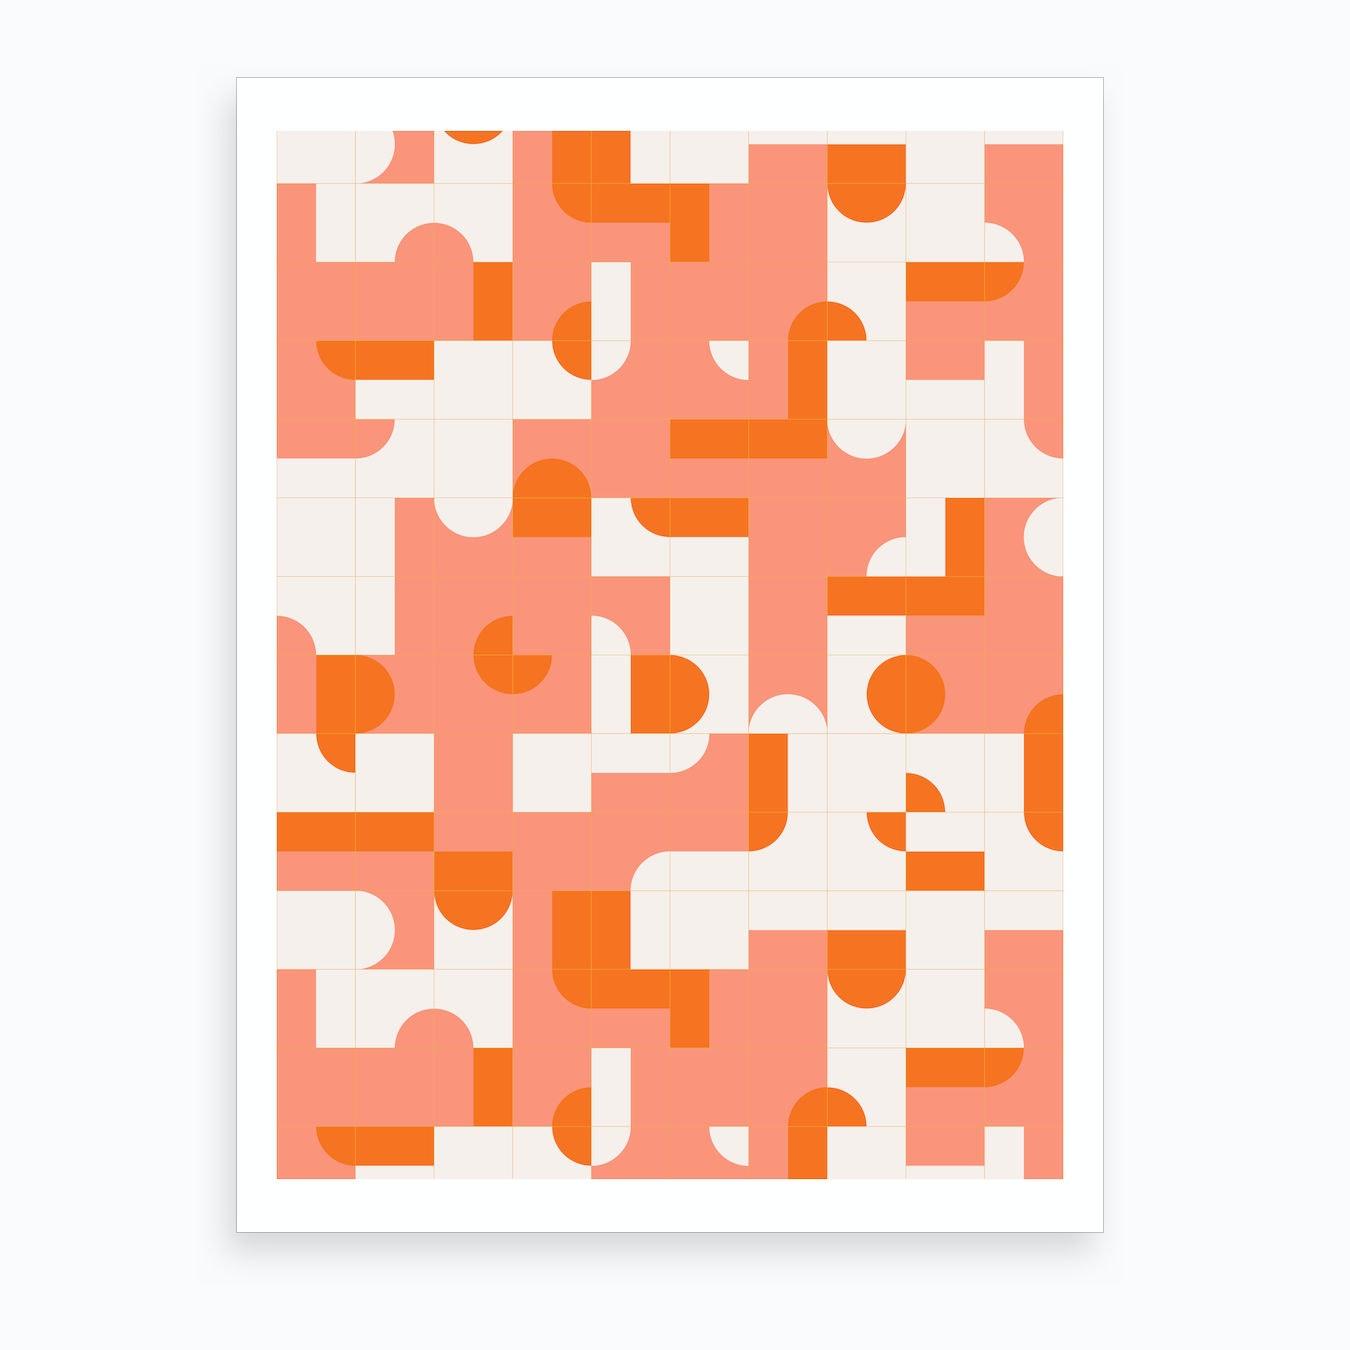 Puzzle Tiles Art Print By Designdn Fy